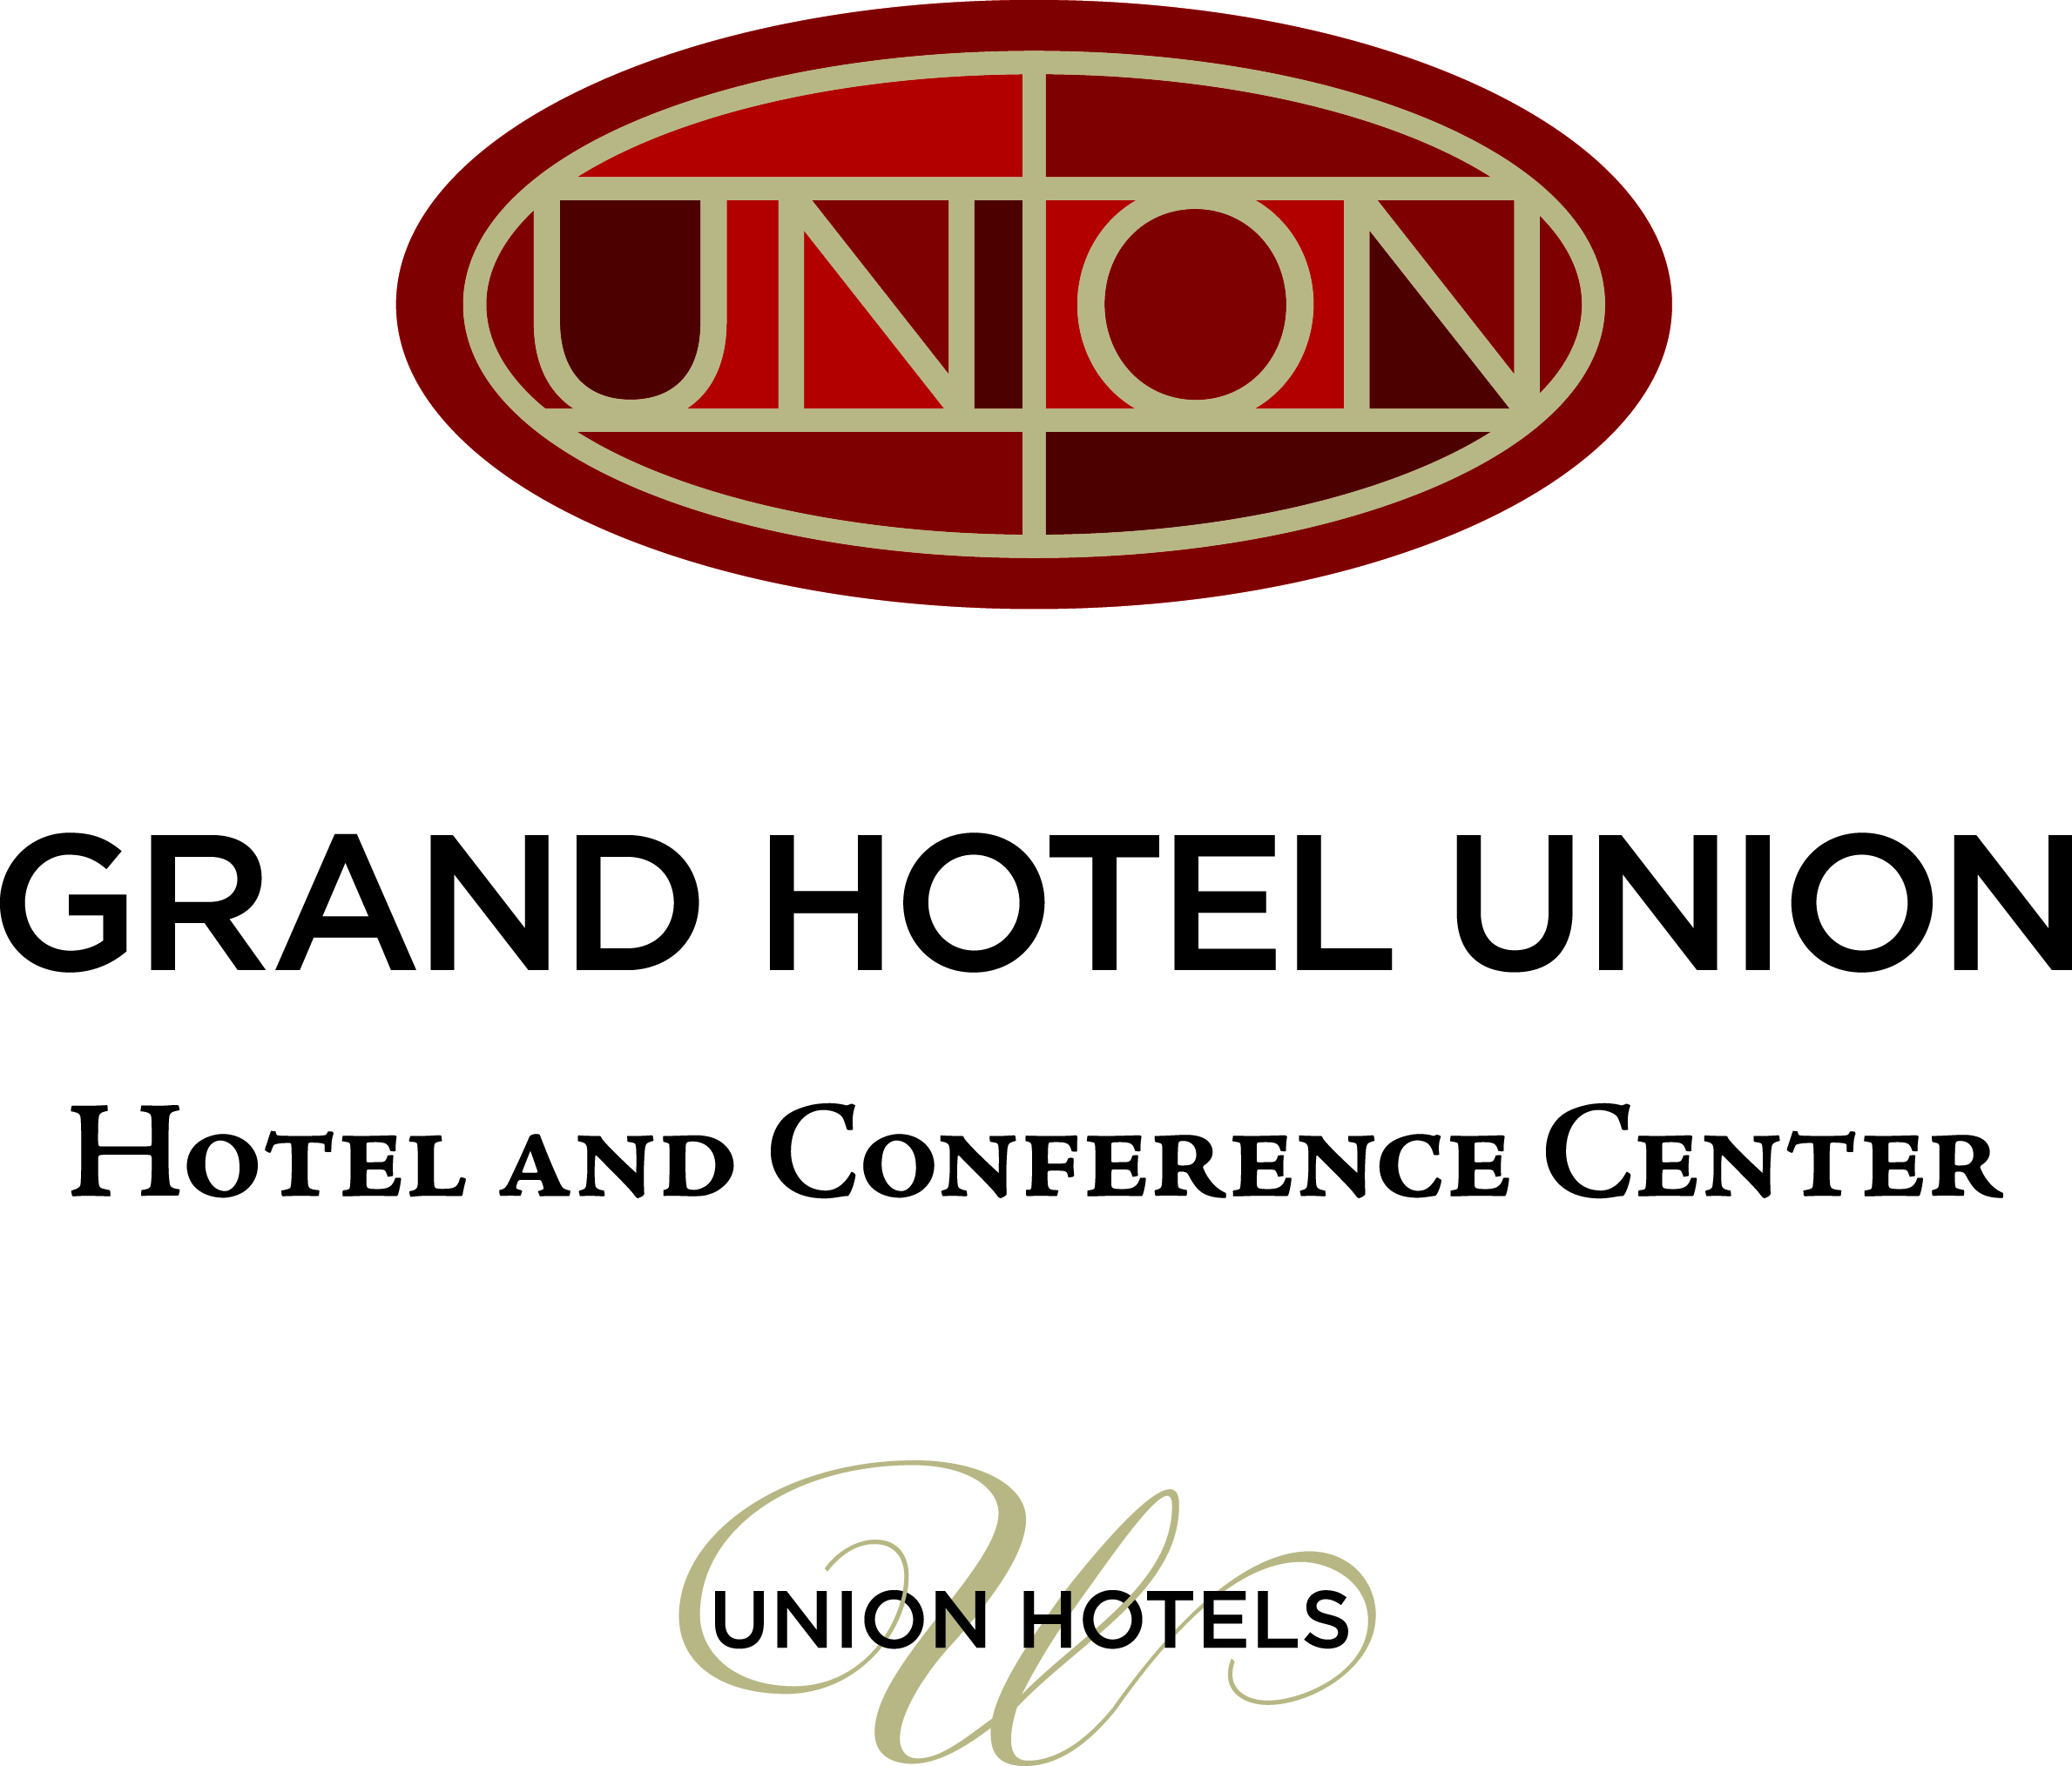 GRAND HOTEL UNION, UNION HOTELS Image